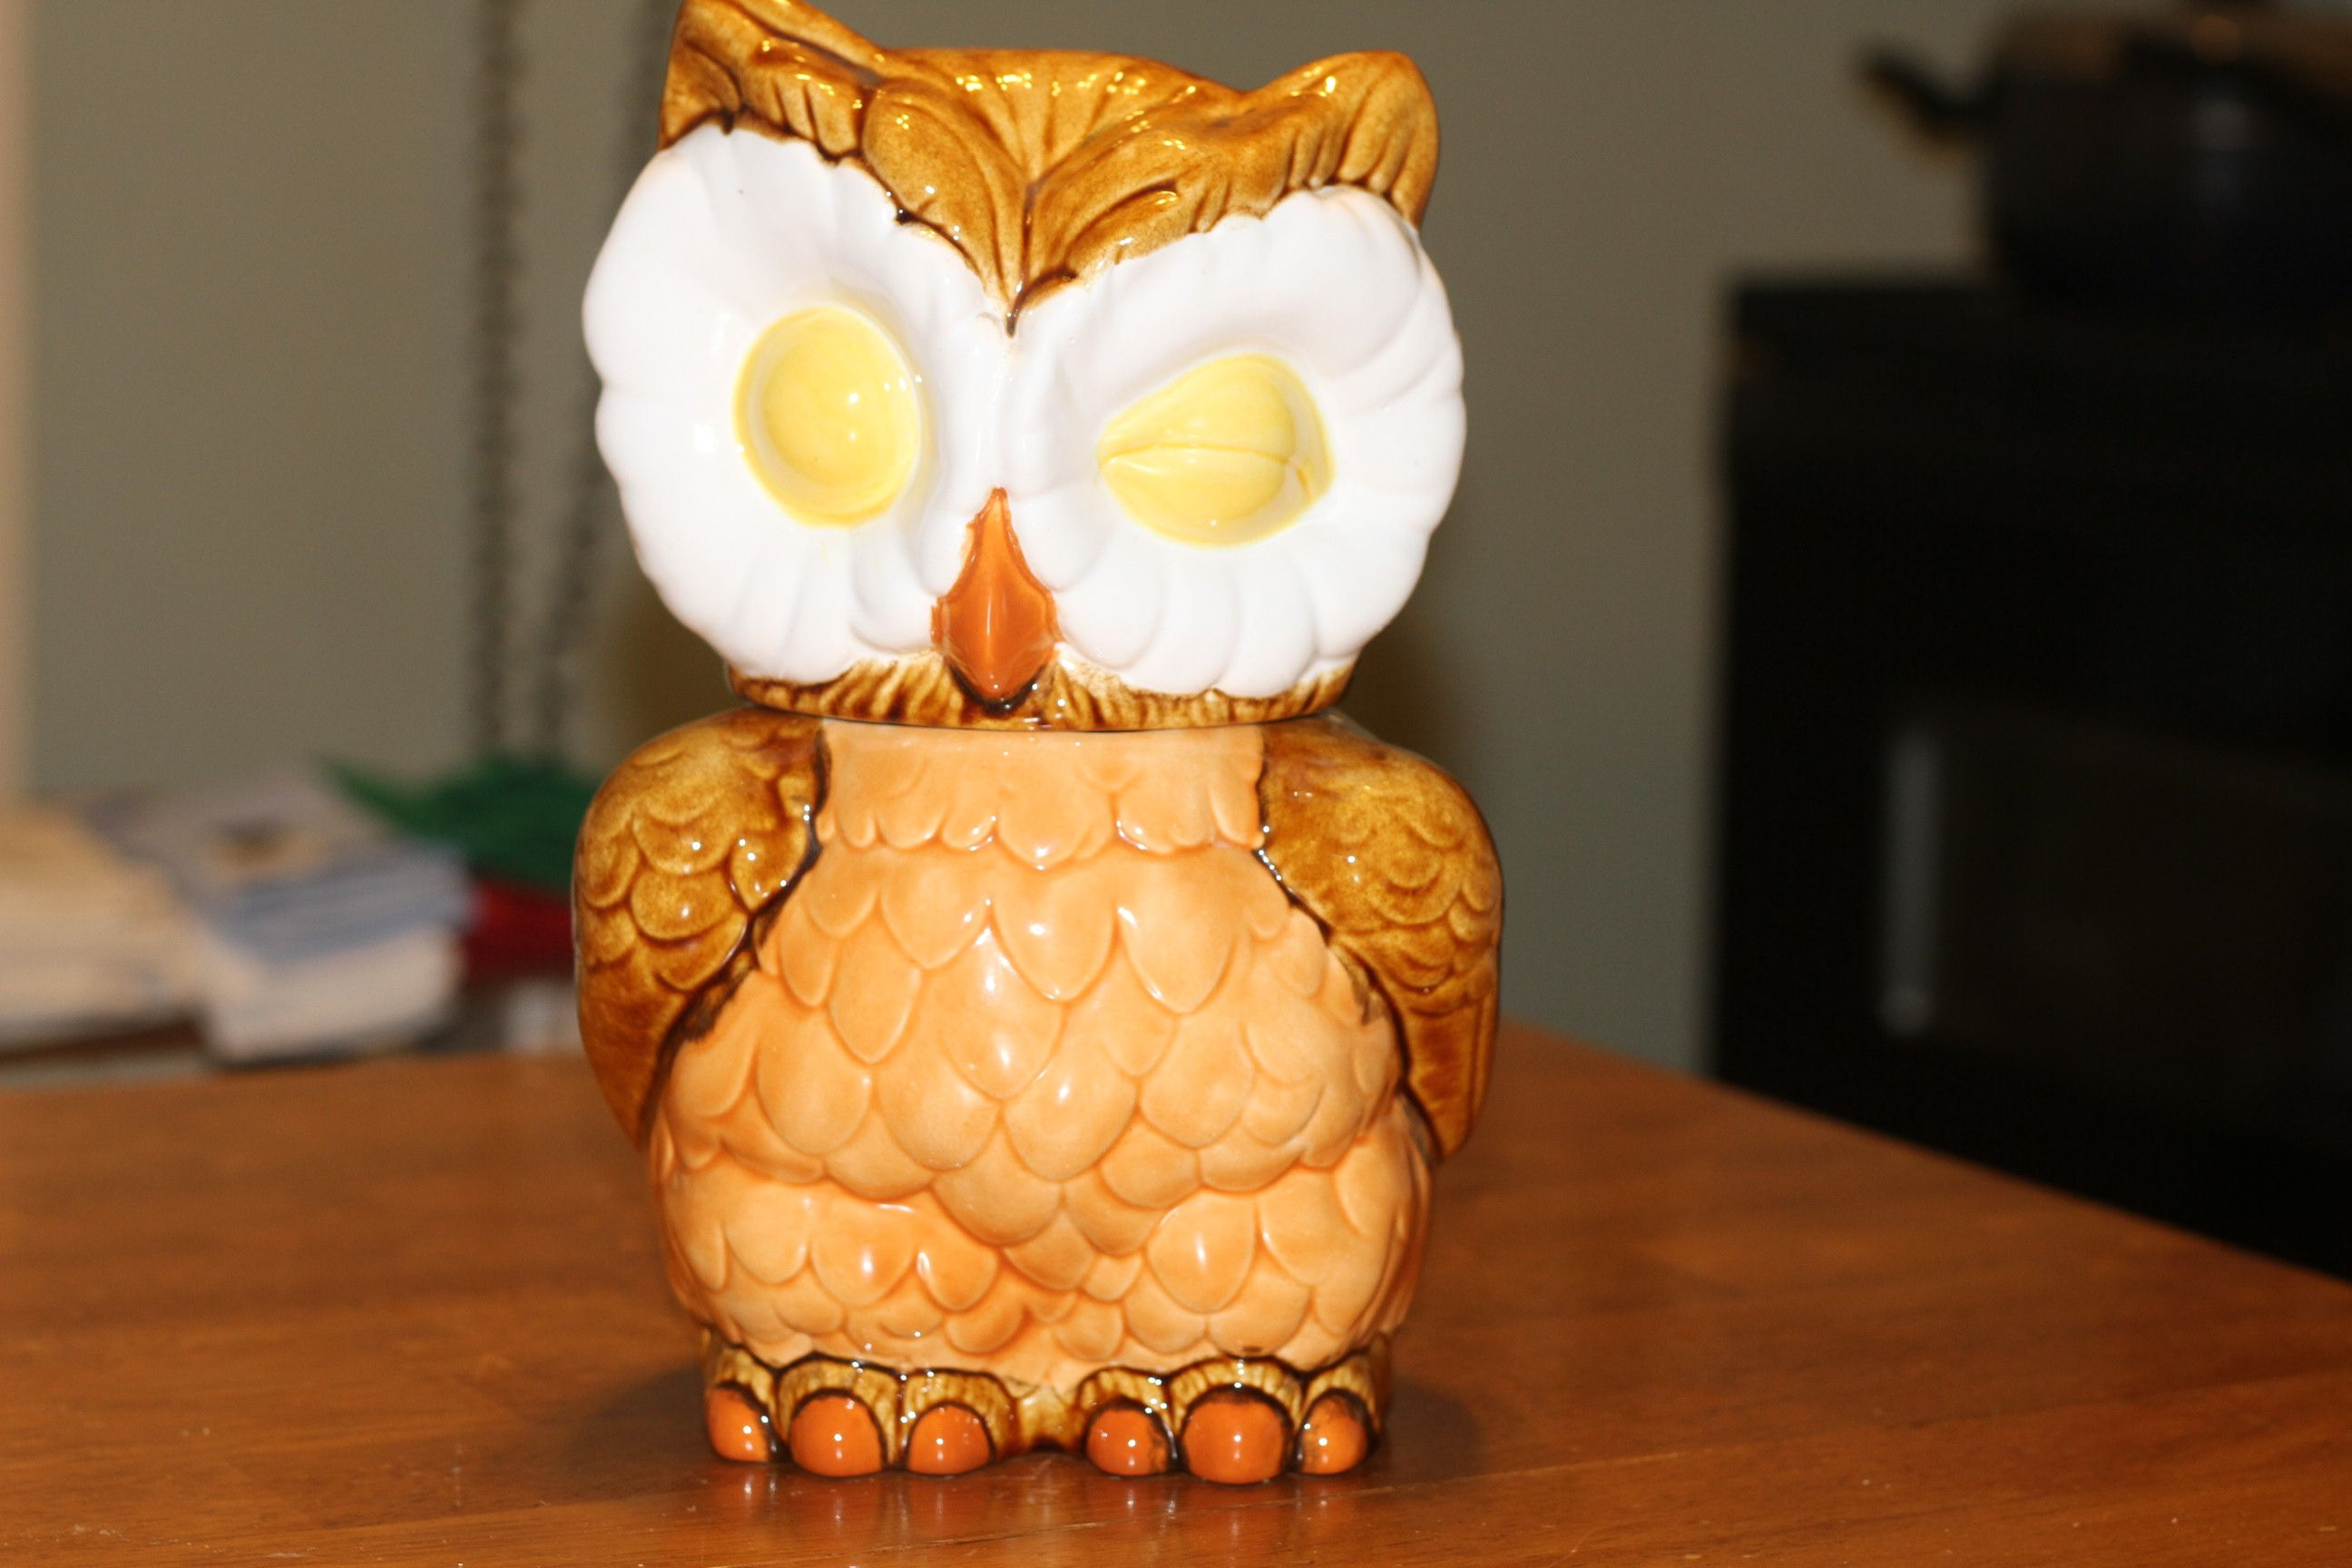 Wise Owl Cooking Jar!